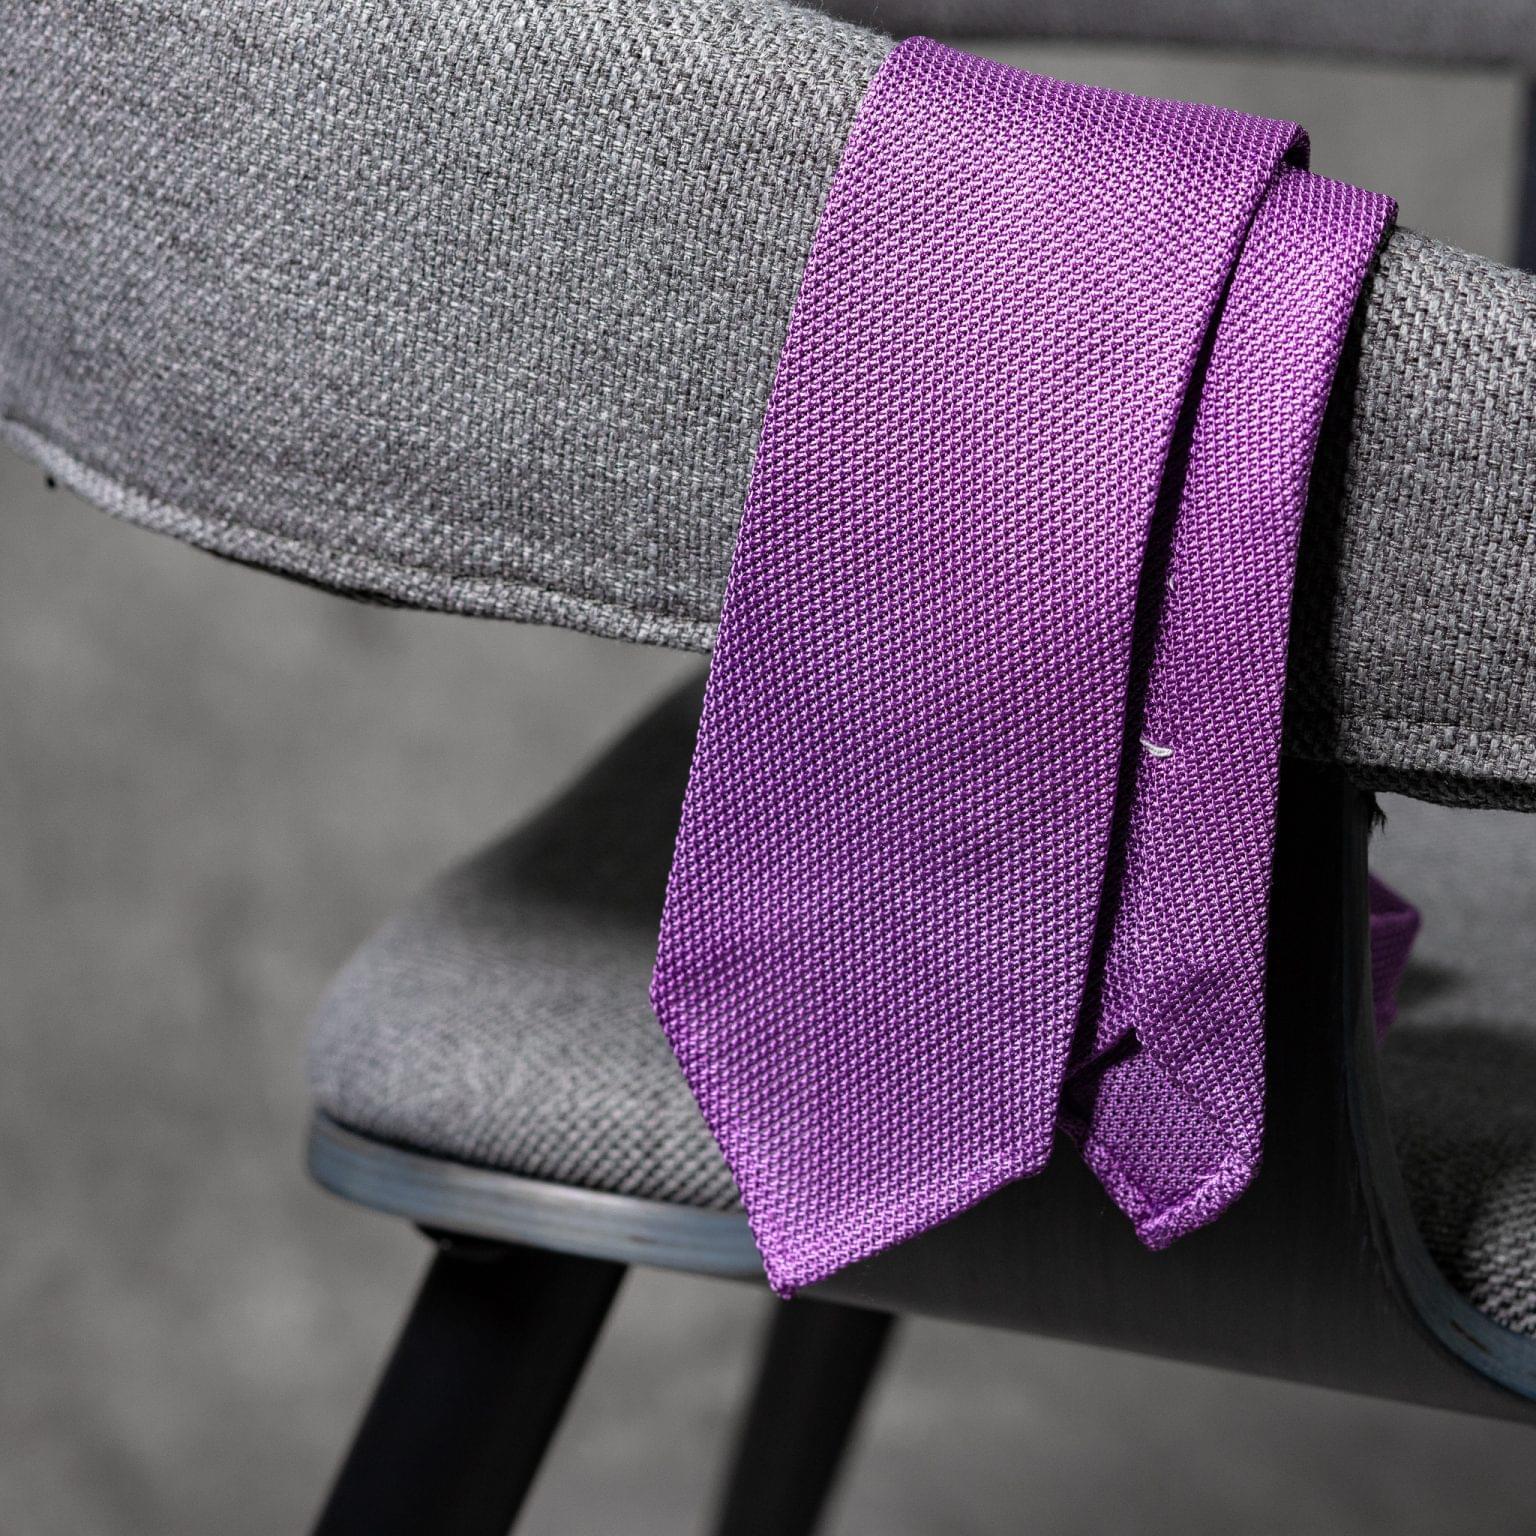 GRENADINE-0154-Tie-Initials-Corbata-Iniciales-The-Seelk-2